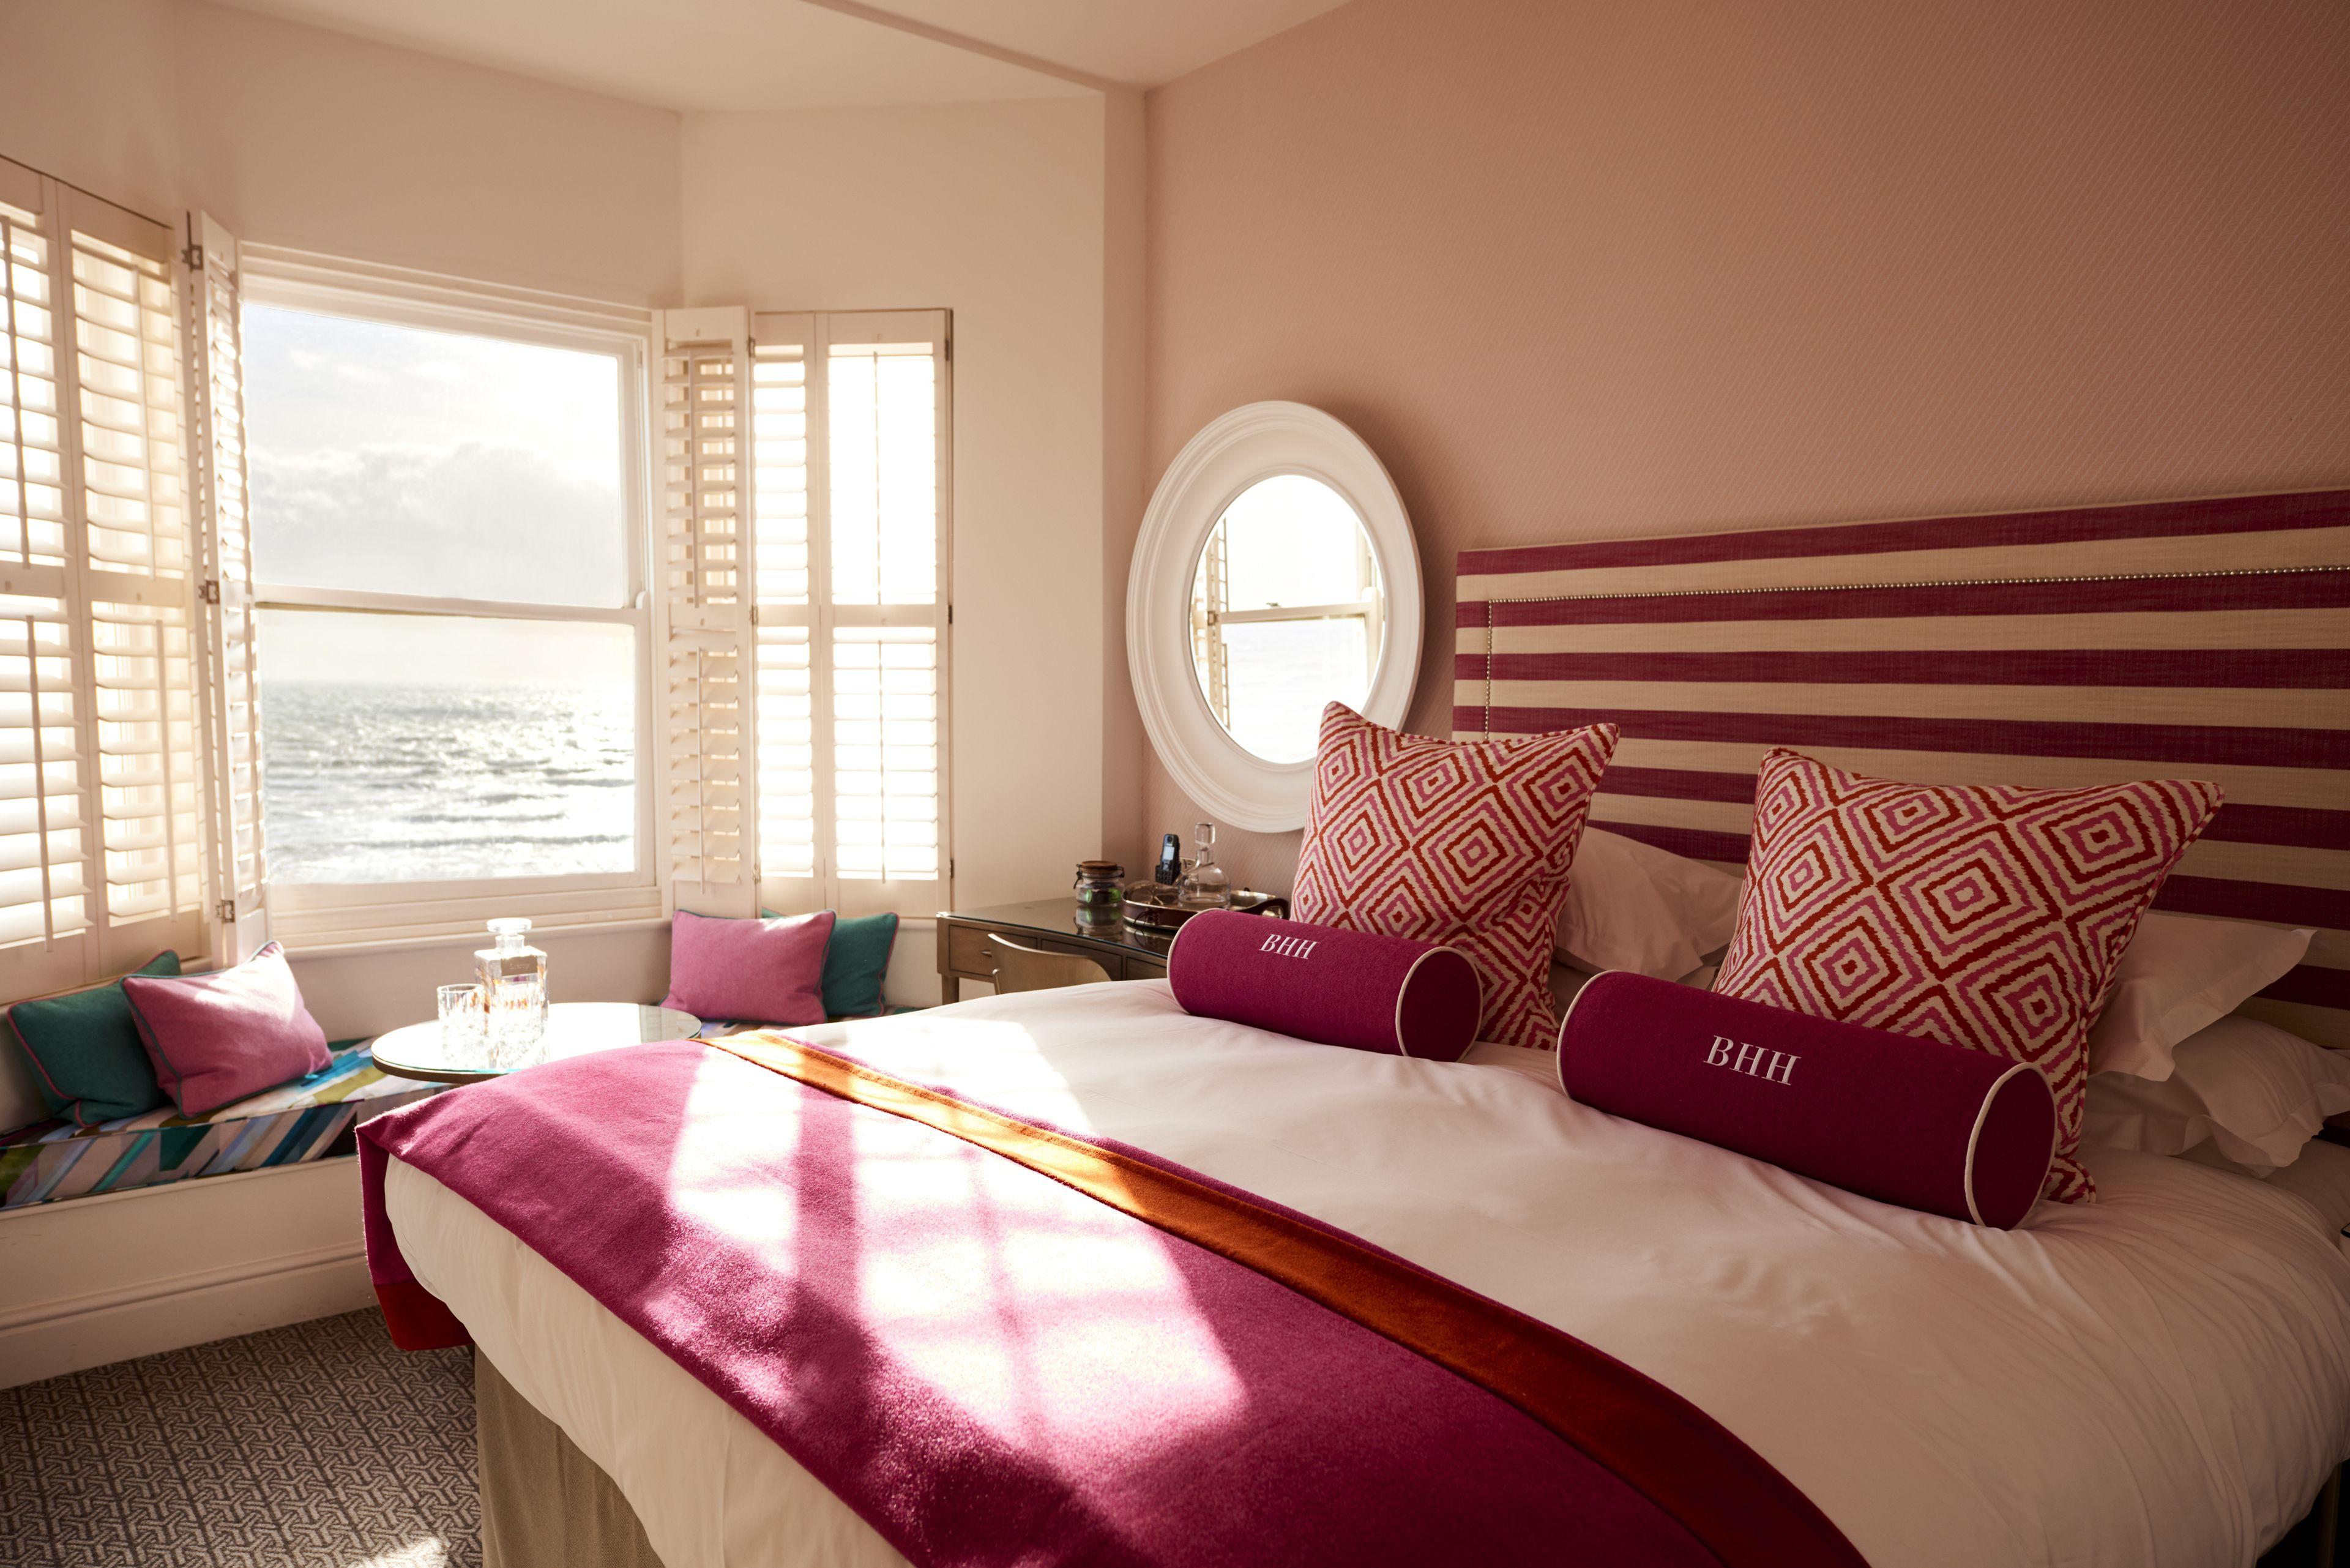 Courtesy of Brighton Harbour Hotel and Spa / Expedia.com